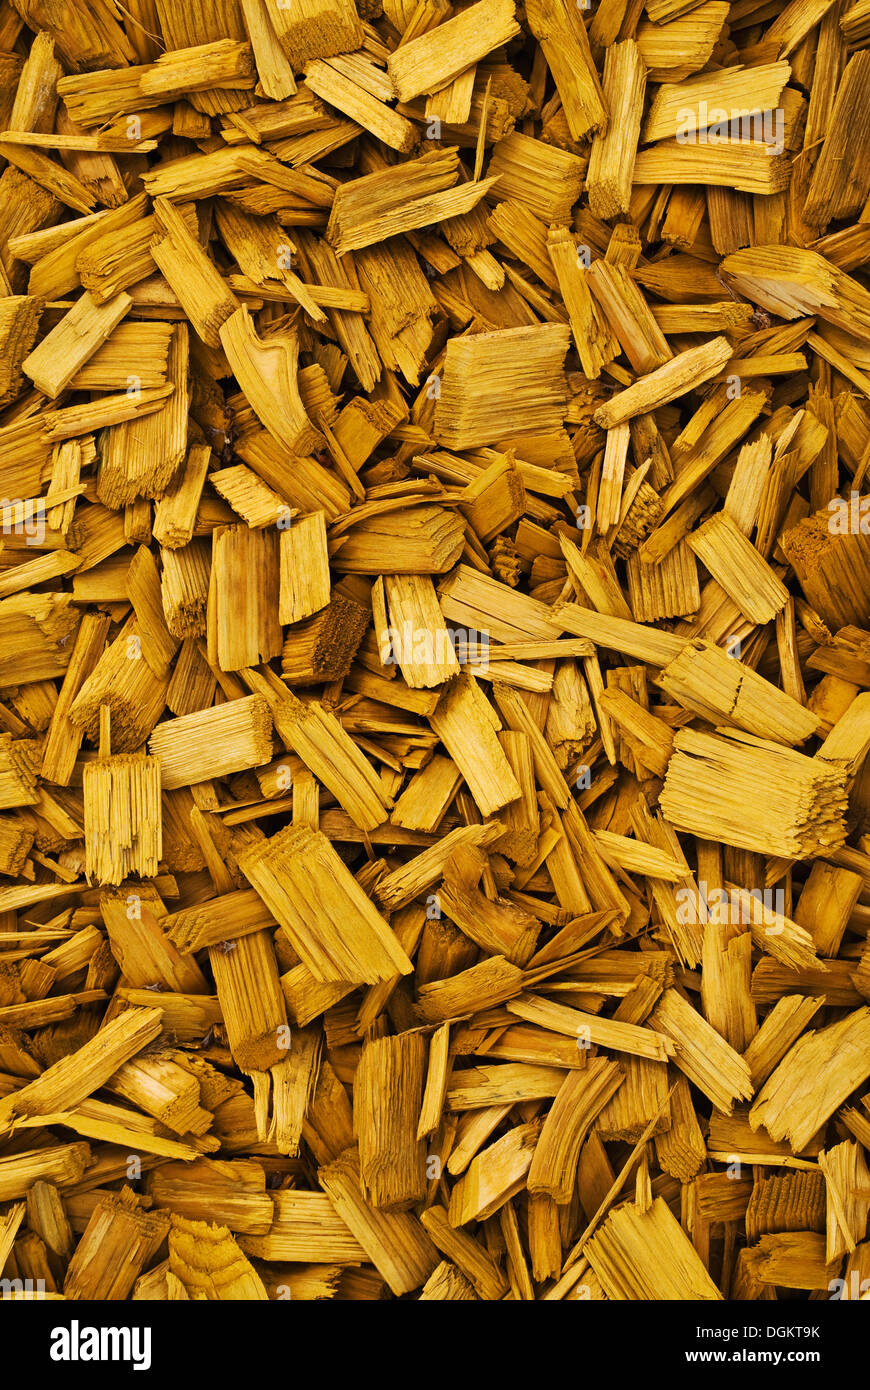 Virutas de madera, fondo Imagen De Stock